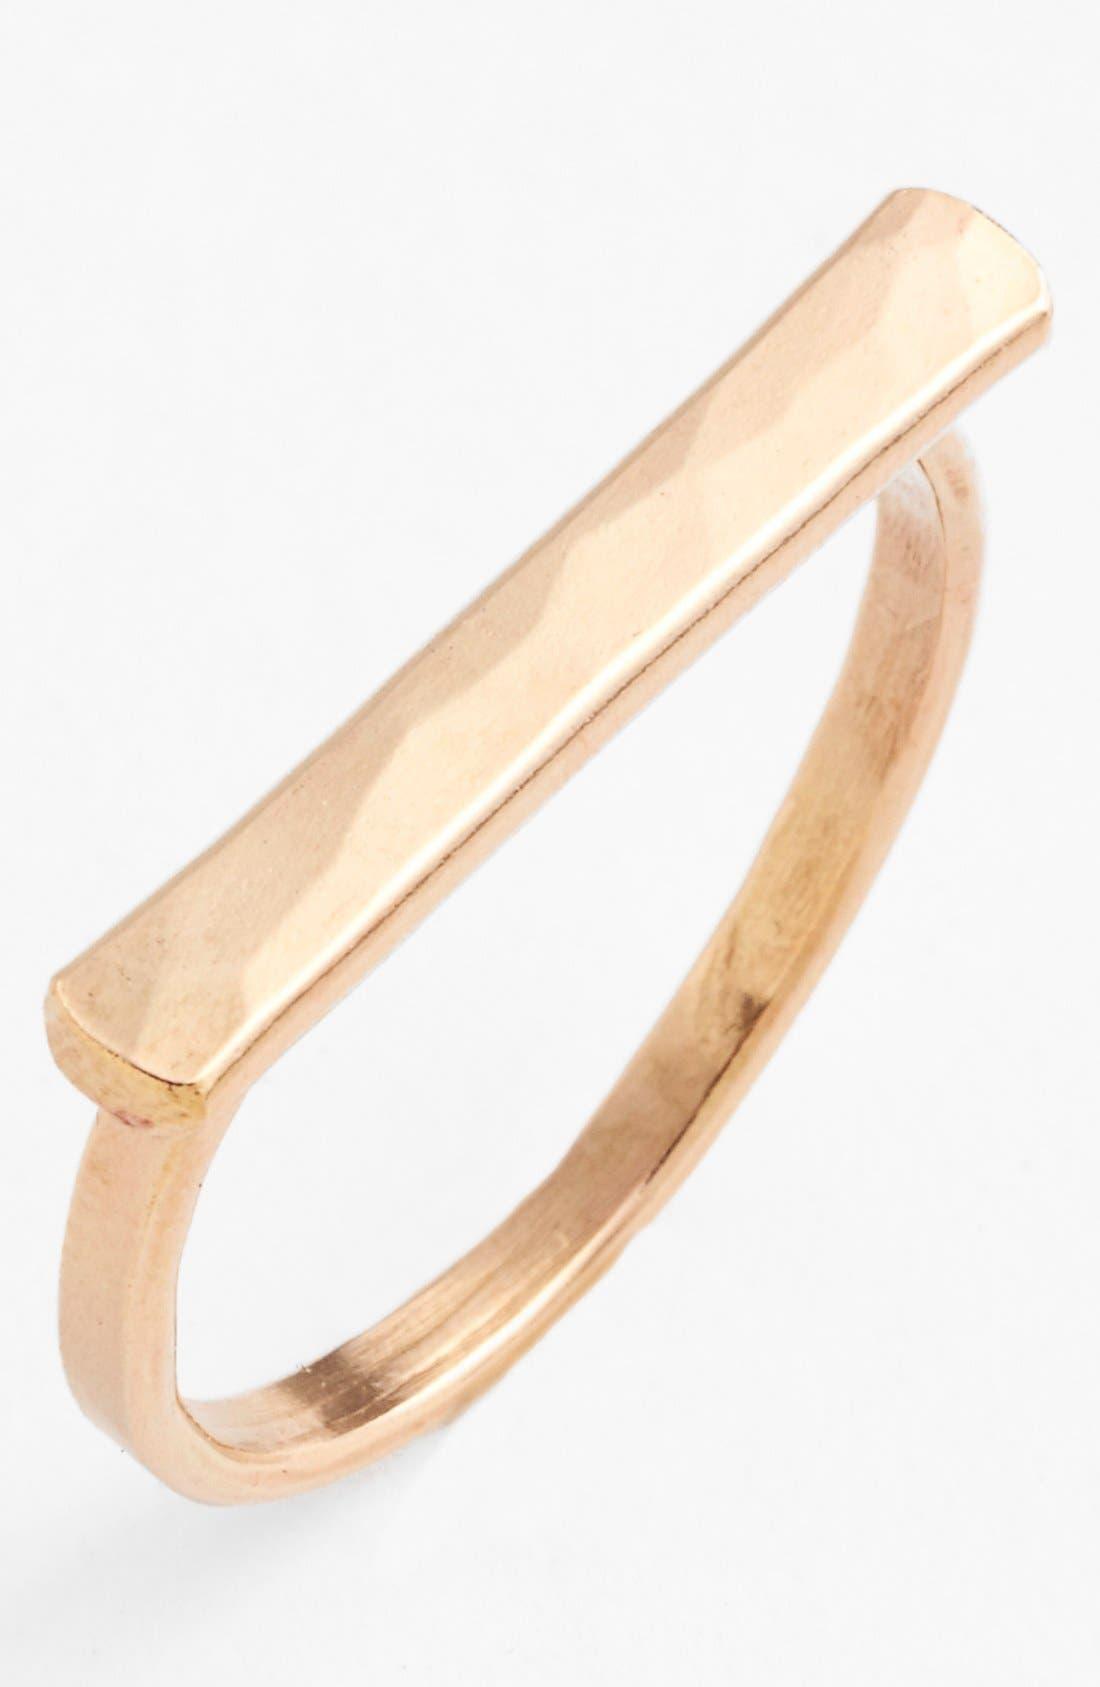 Main Image - Ija Bar Ring